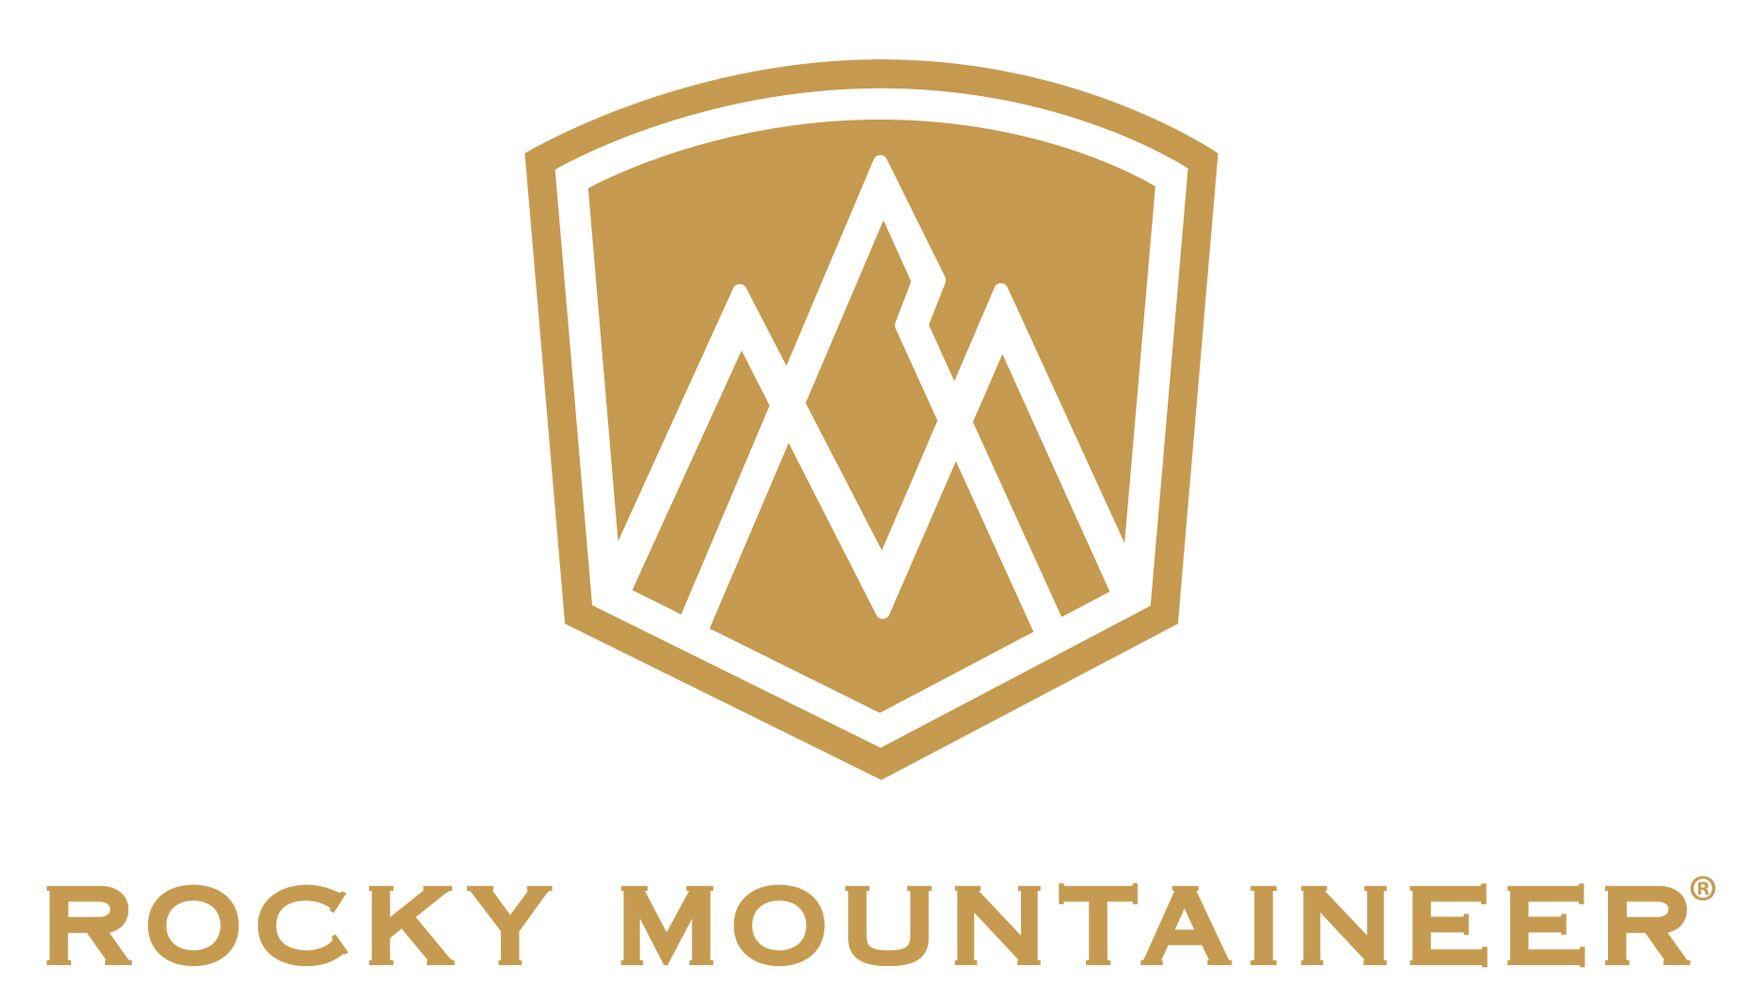 Rocky Mountaineer.jpg